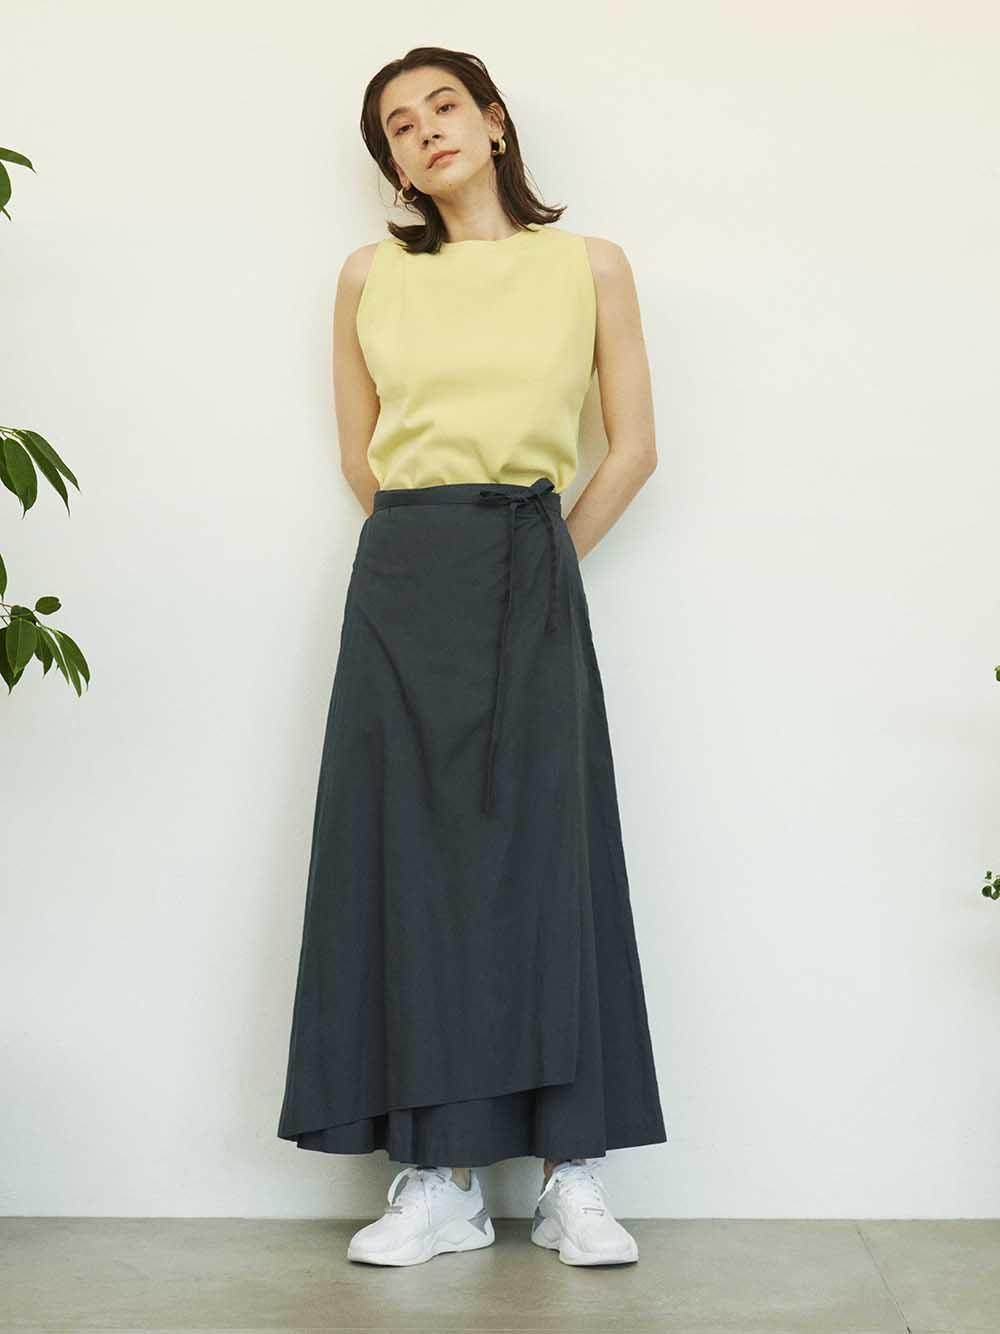 【emmi atelier】リネンナロー巻きスカート(NVY-0)